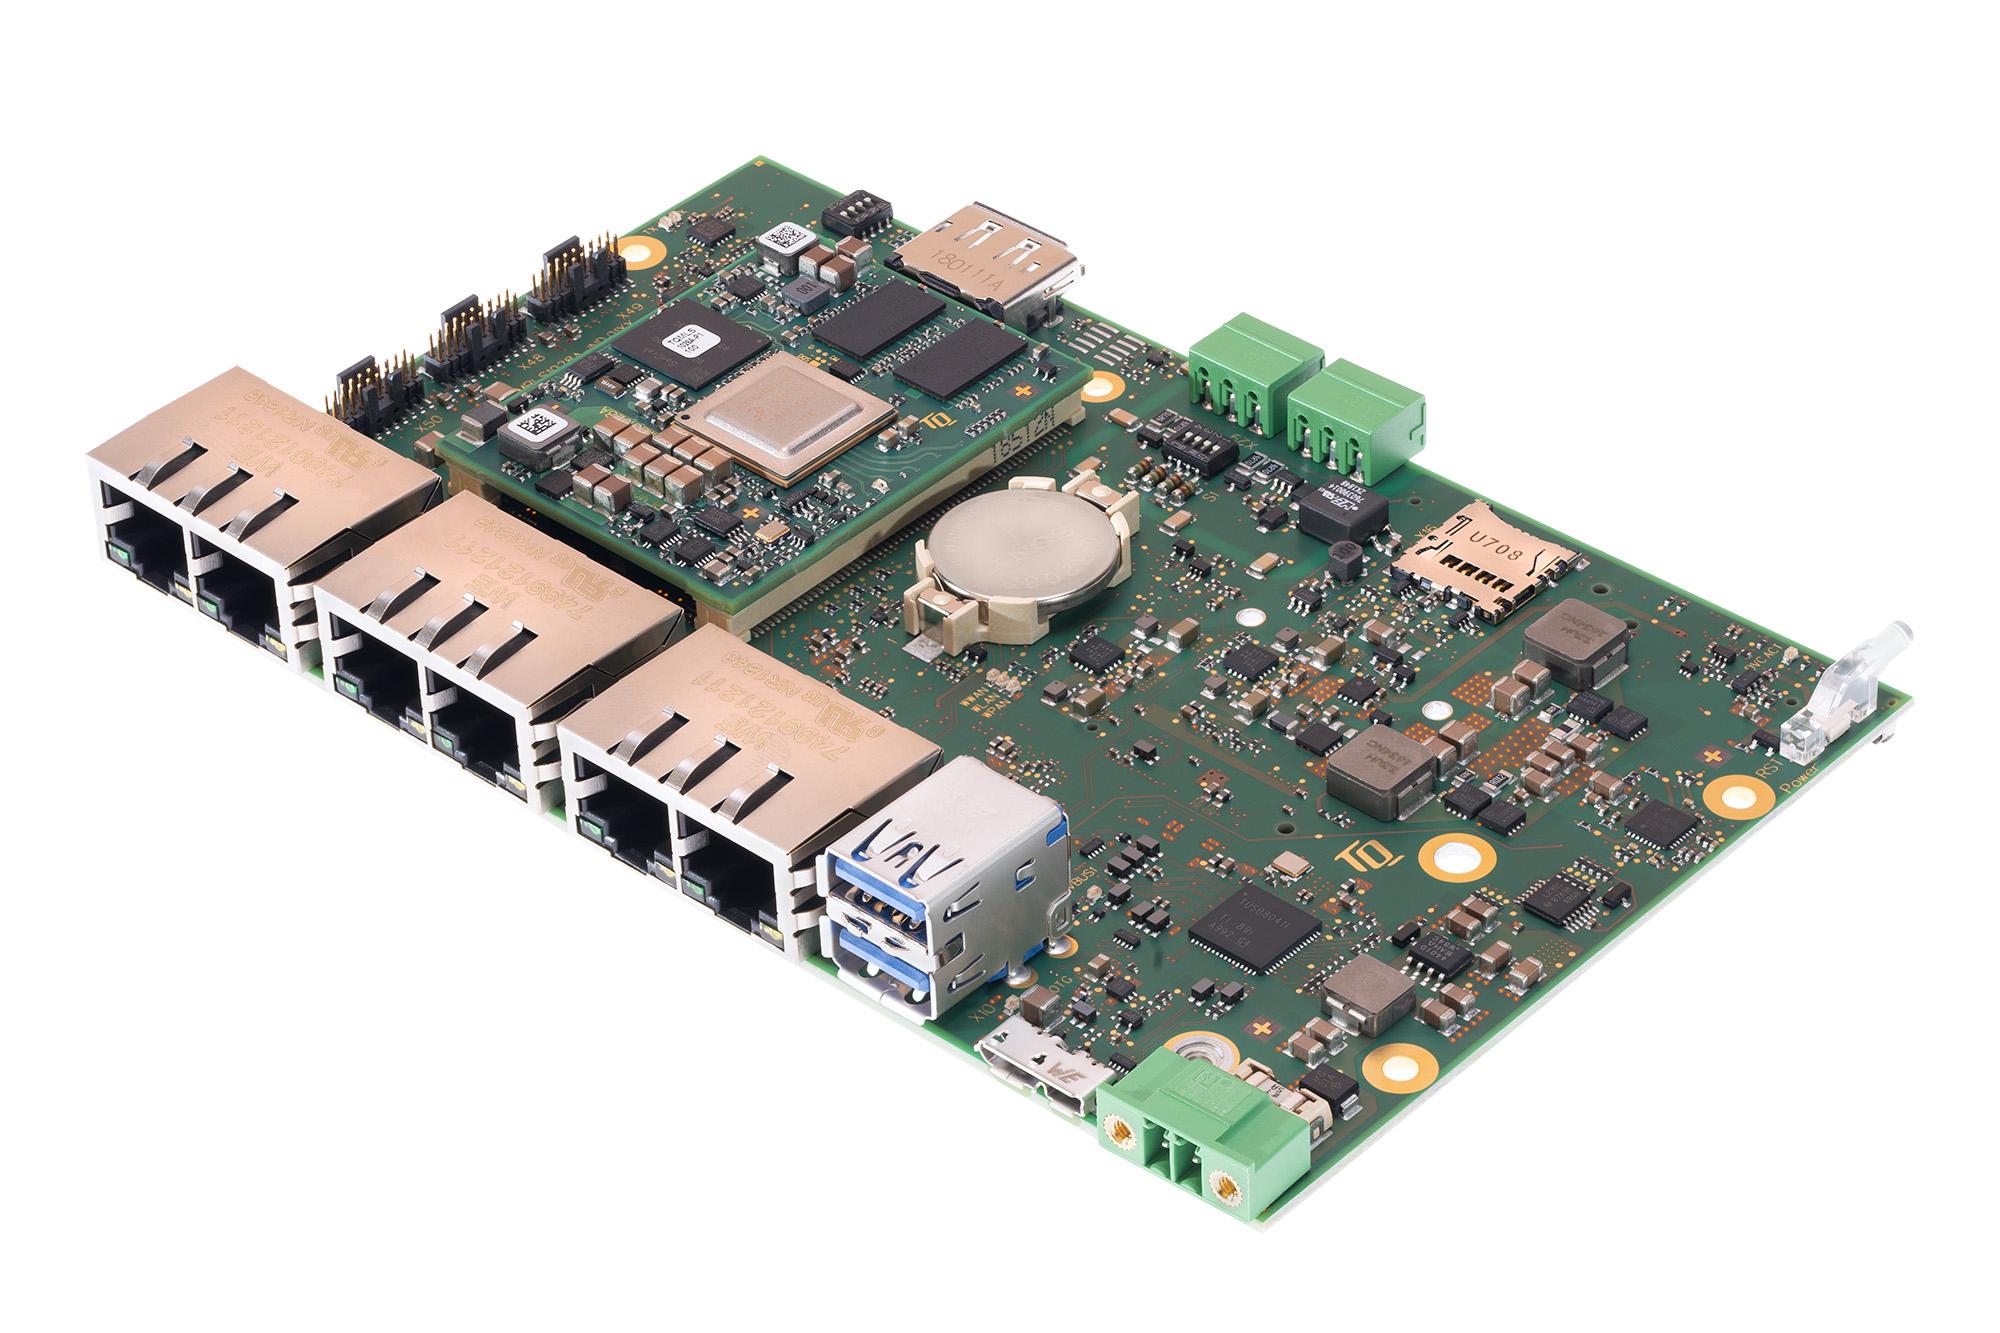 New TQ platform based on Layerscape Dual Cortex-A72 technology